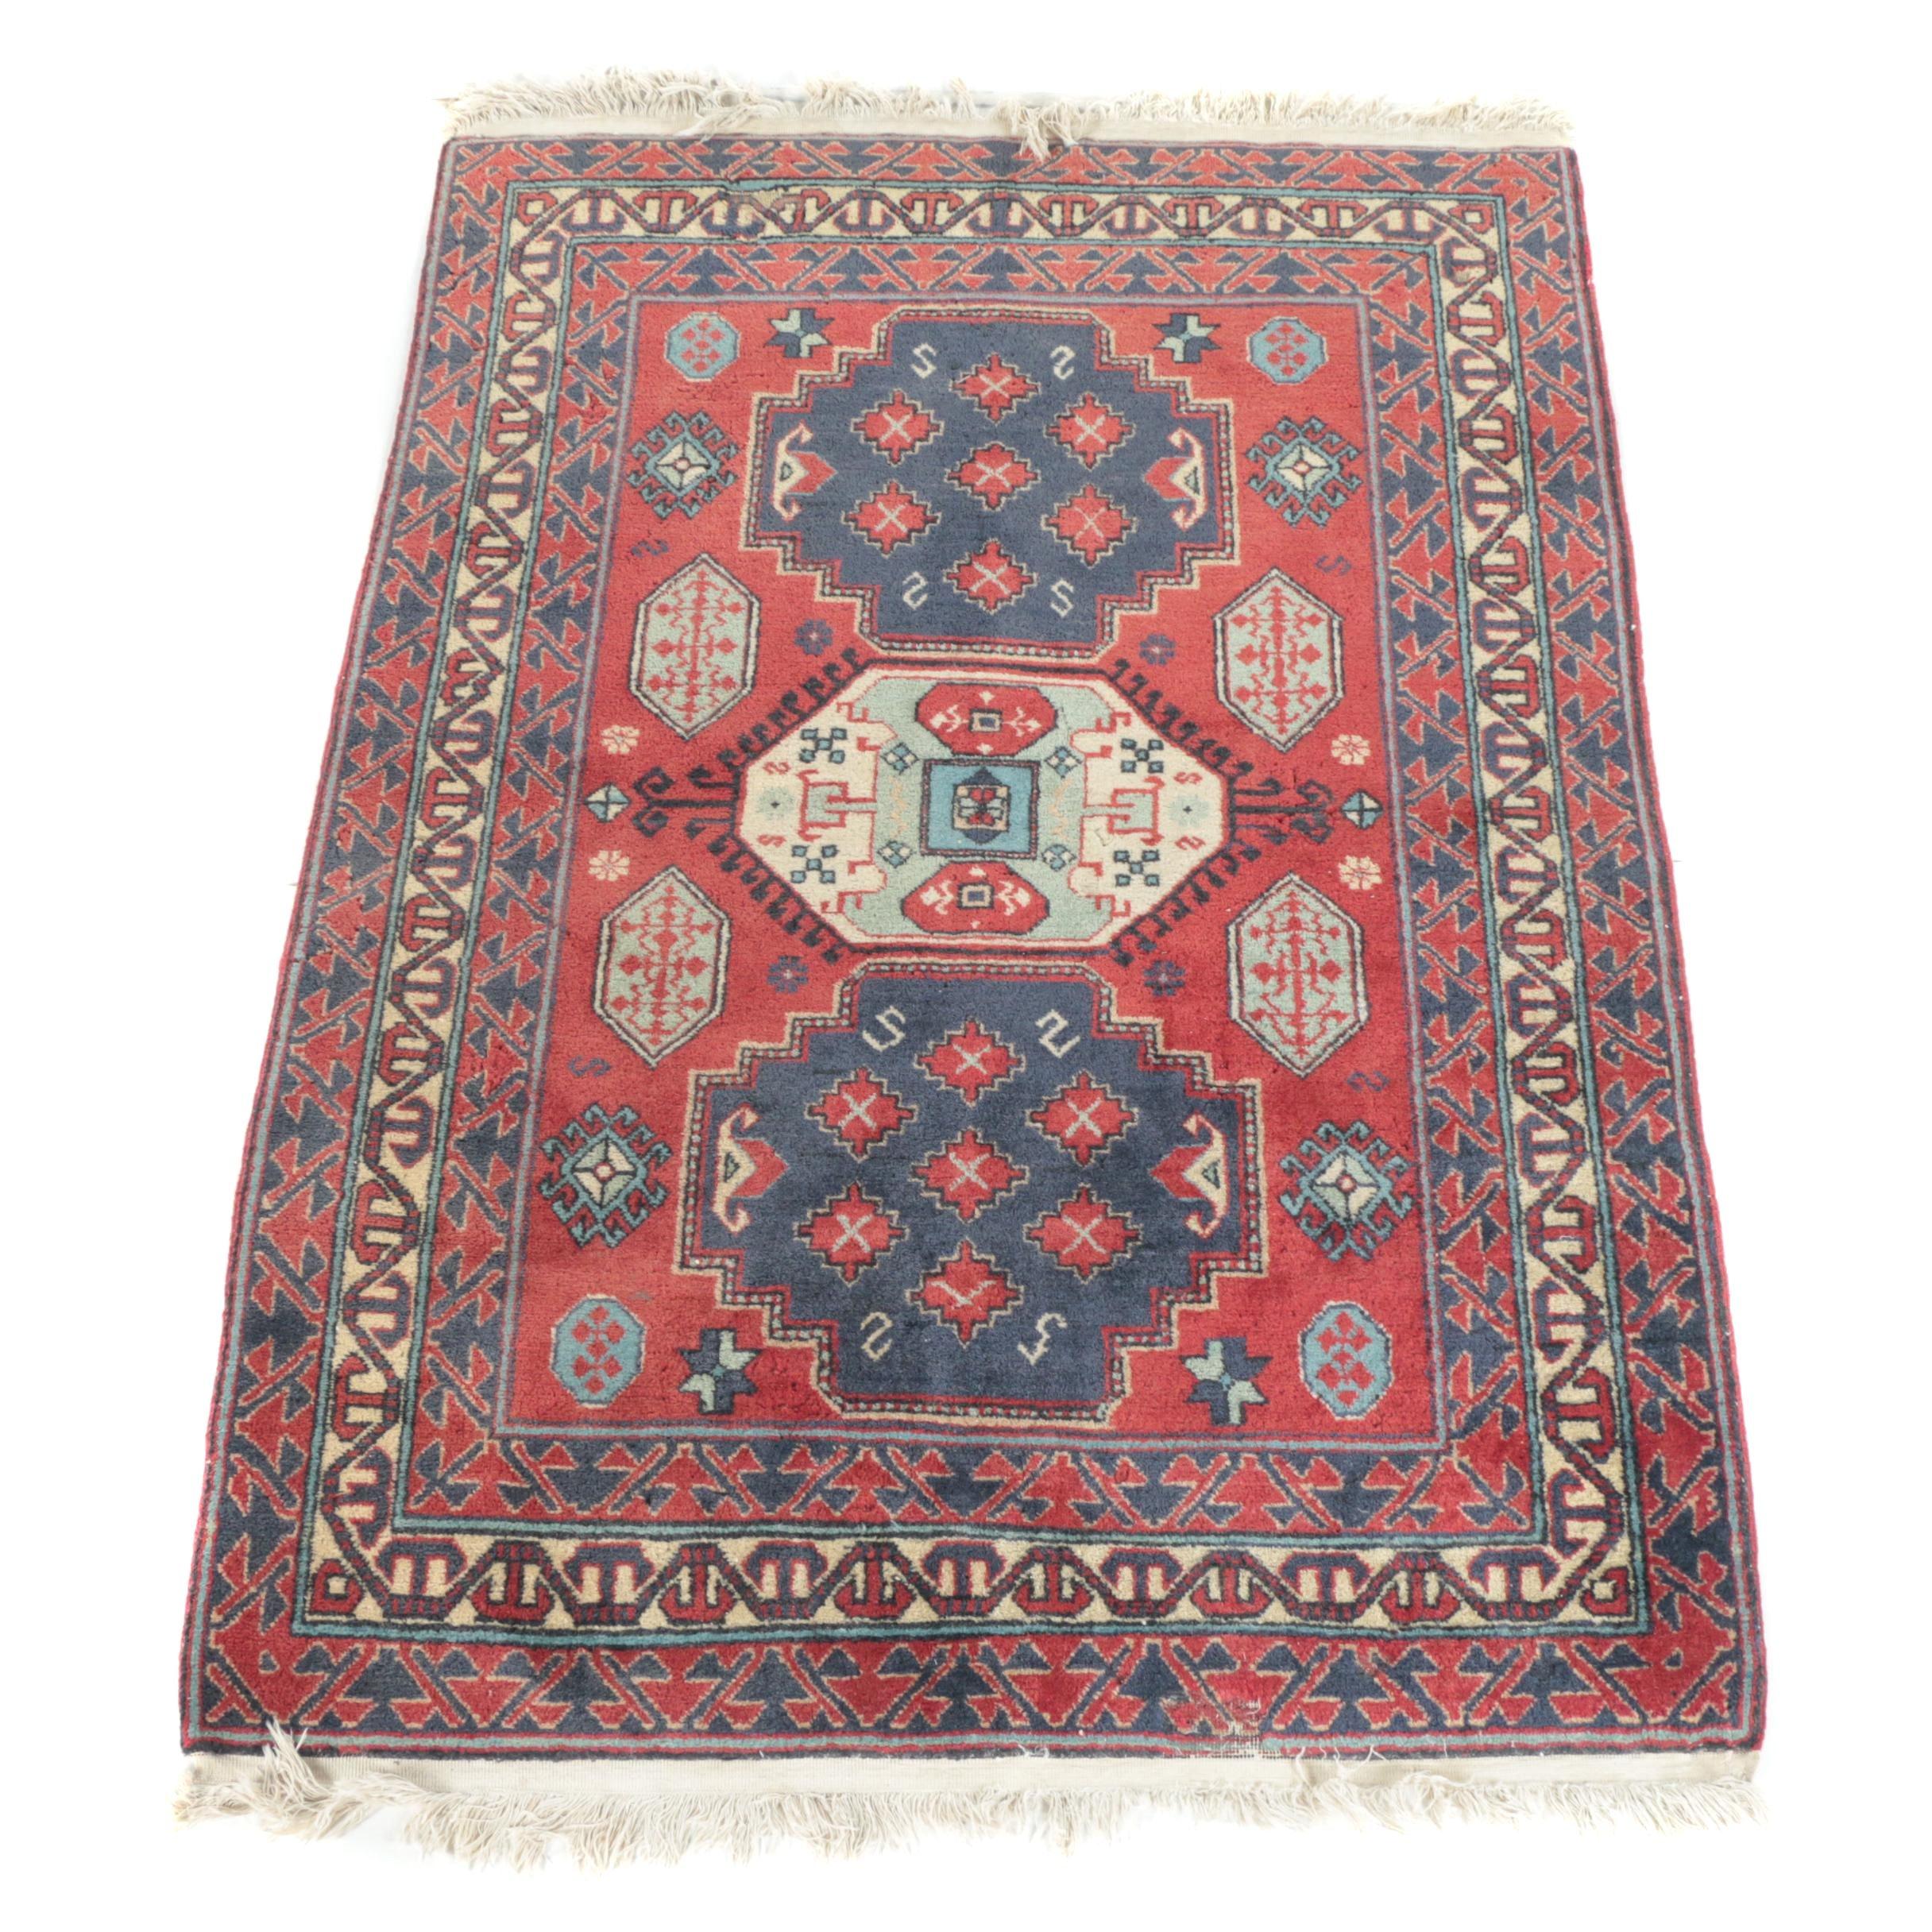 Vintage Hand-Knotted Caucasian Kazak Wool Area Rug